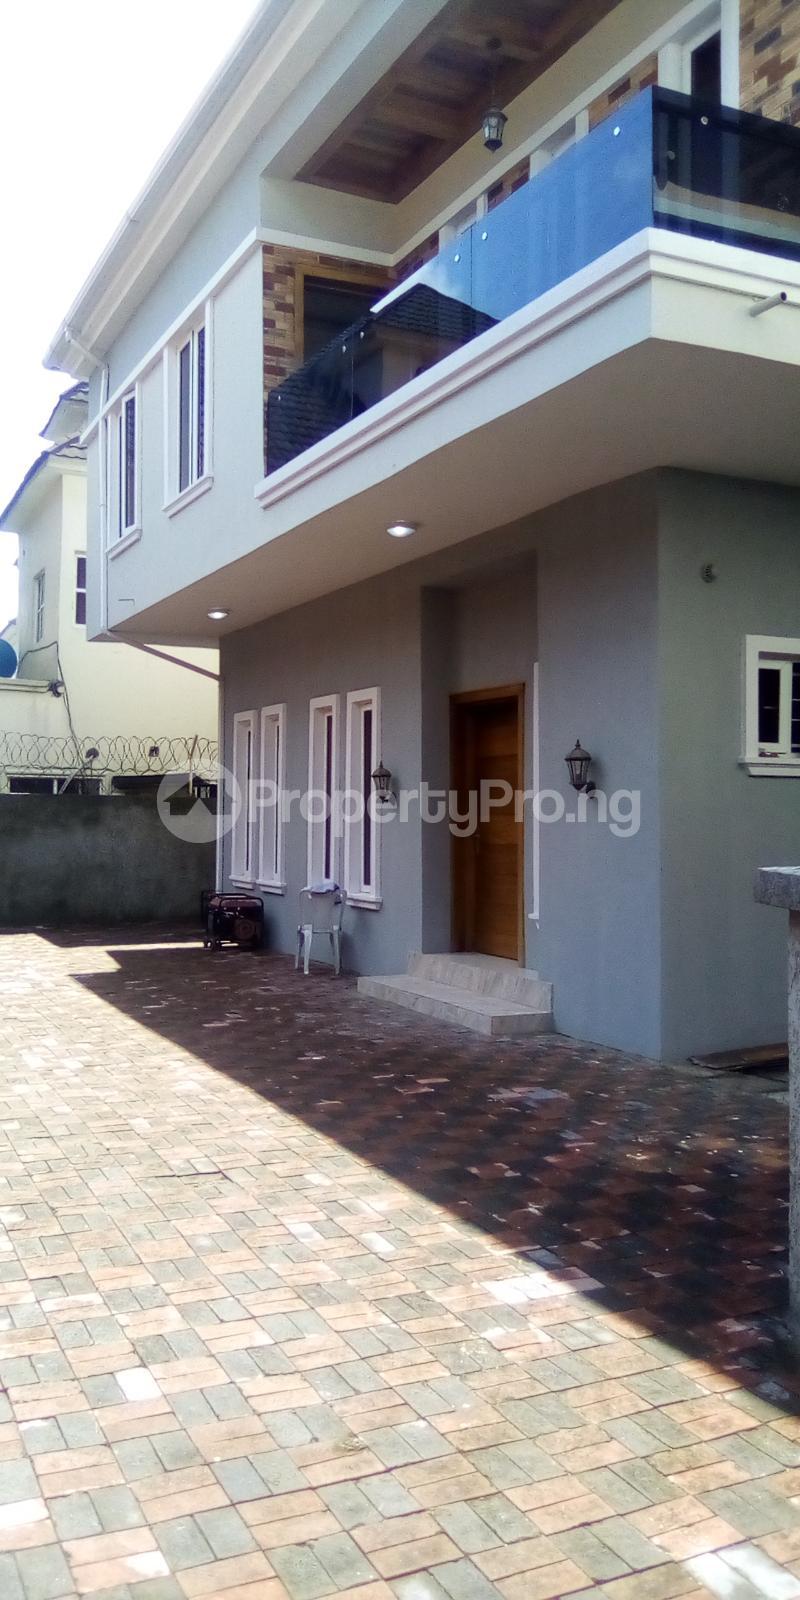 5 bedroom Detached Duplex for sale Southern View Oral Estate Lekki Lagos - 0